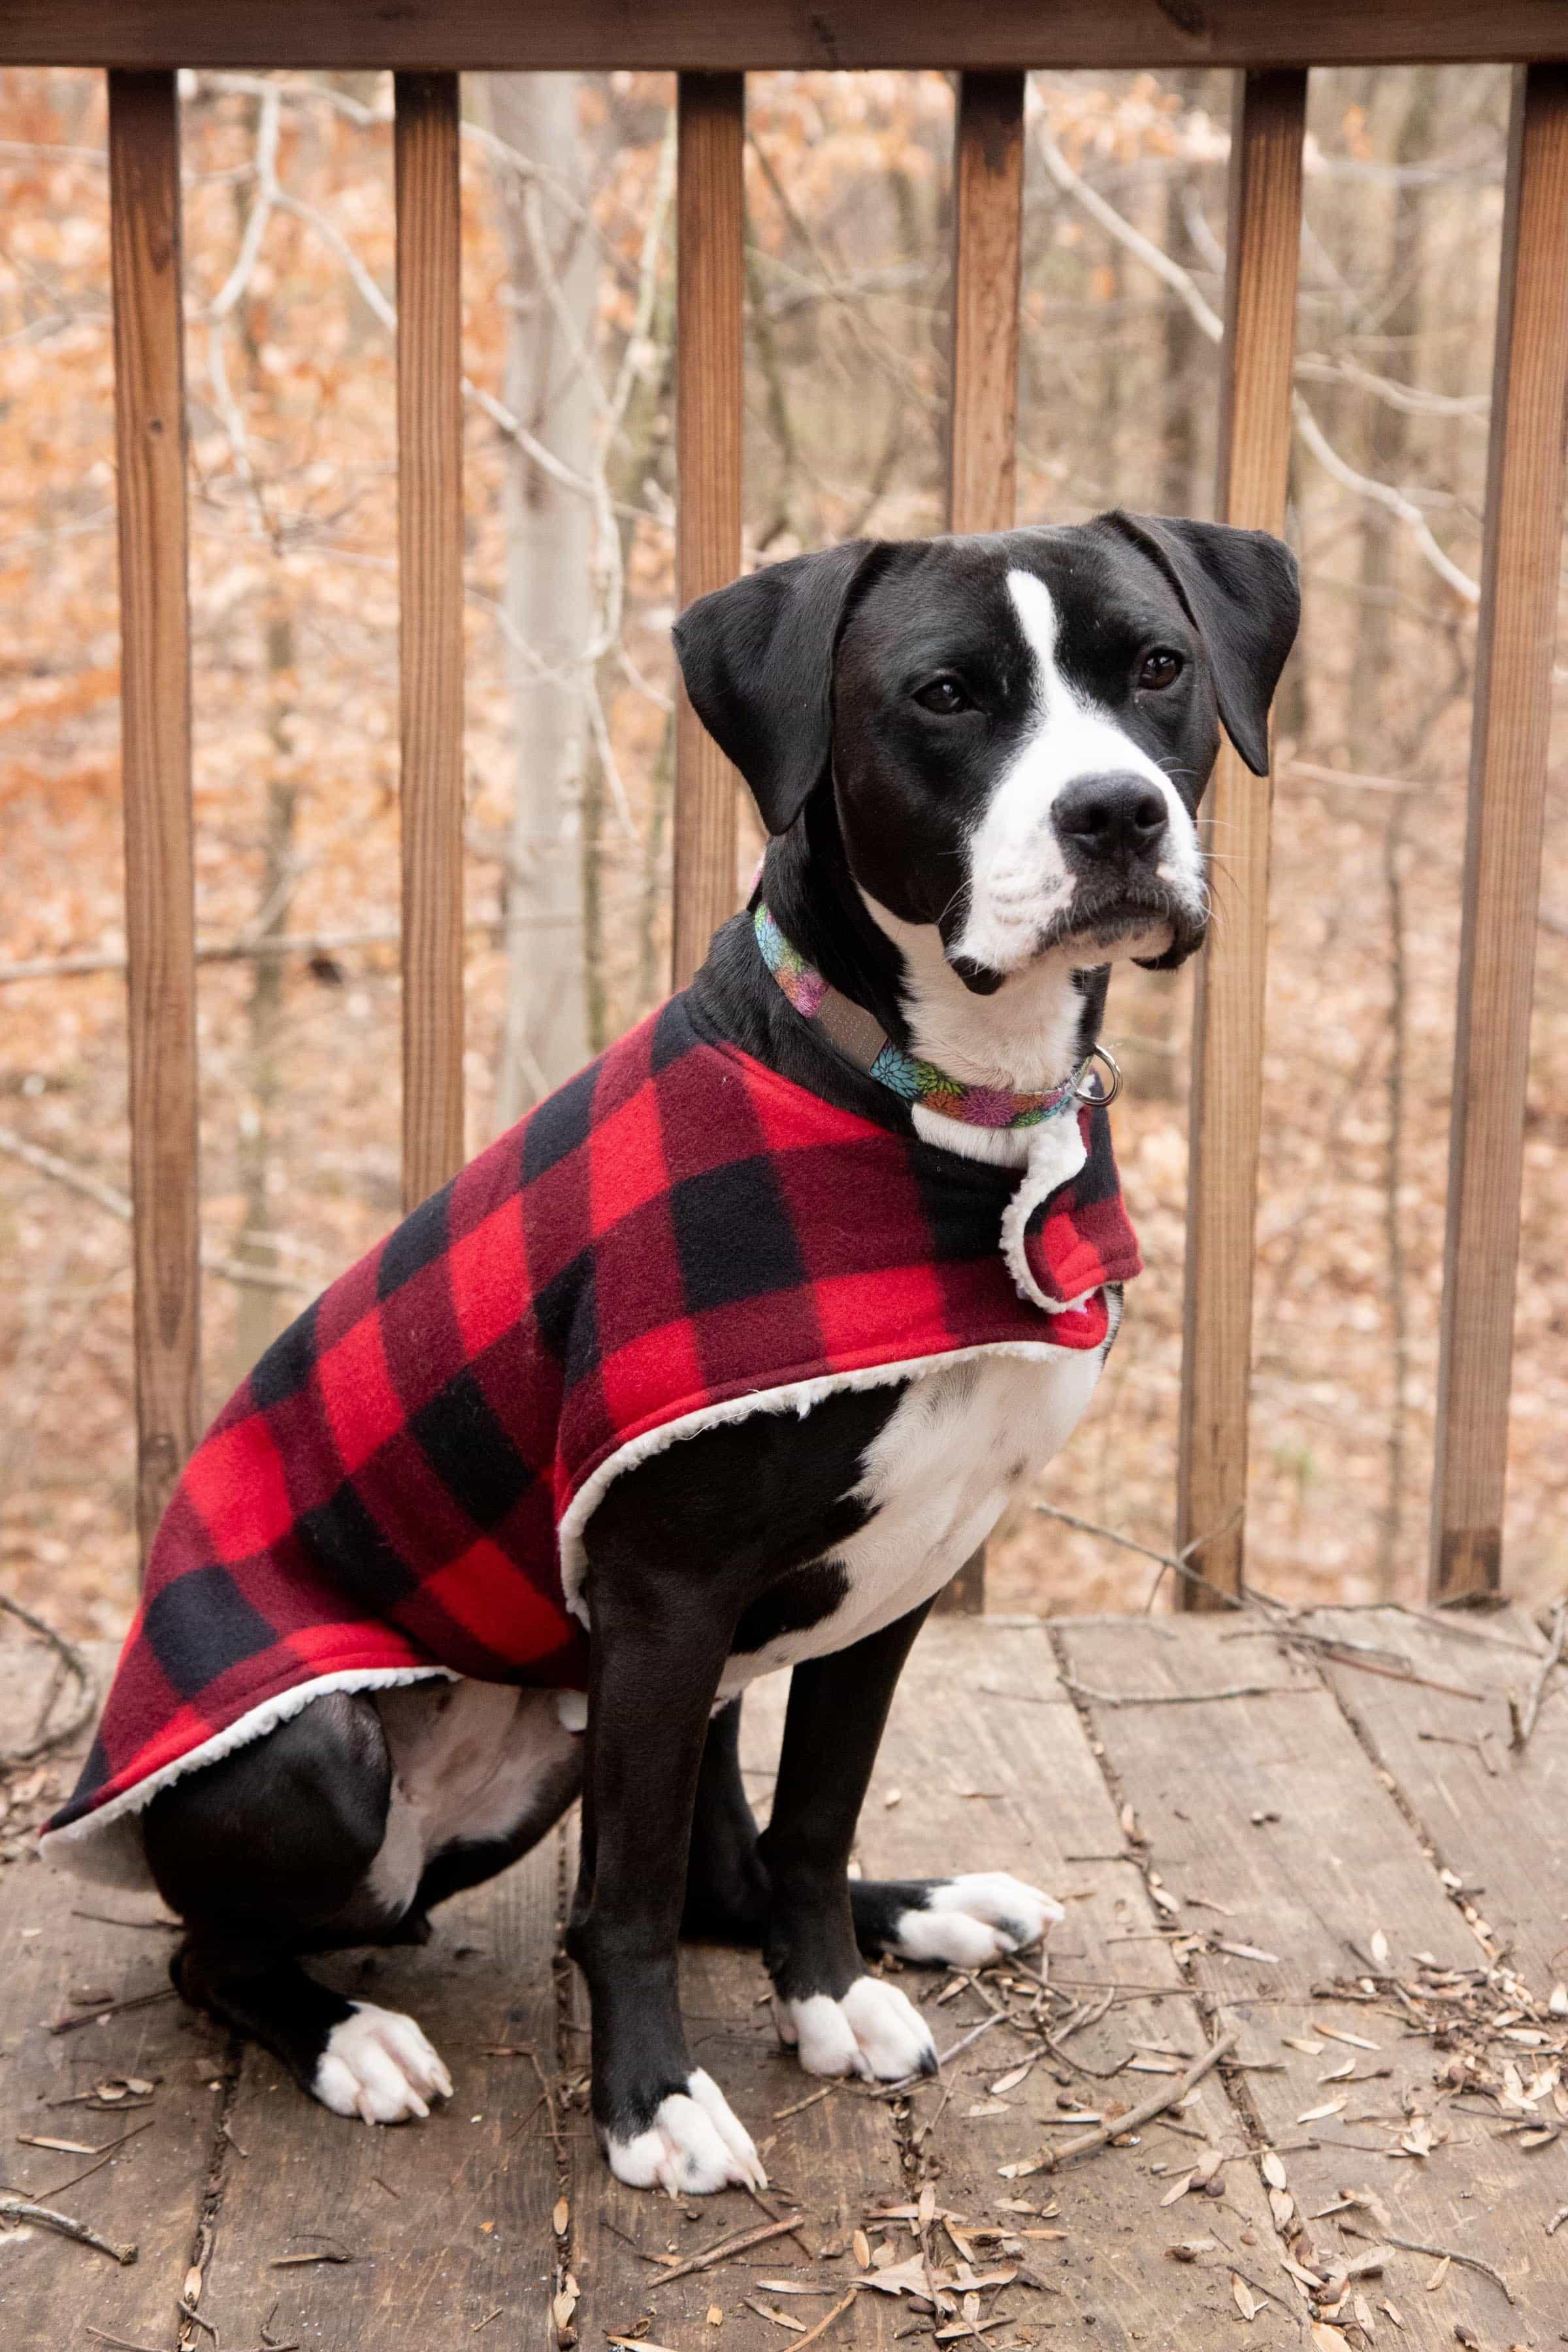 c04f71eaf How to Sew a Cozy Custom Dog Coat in Less than an Hour